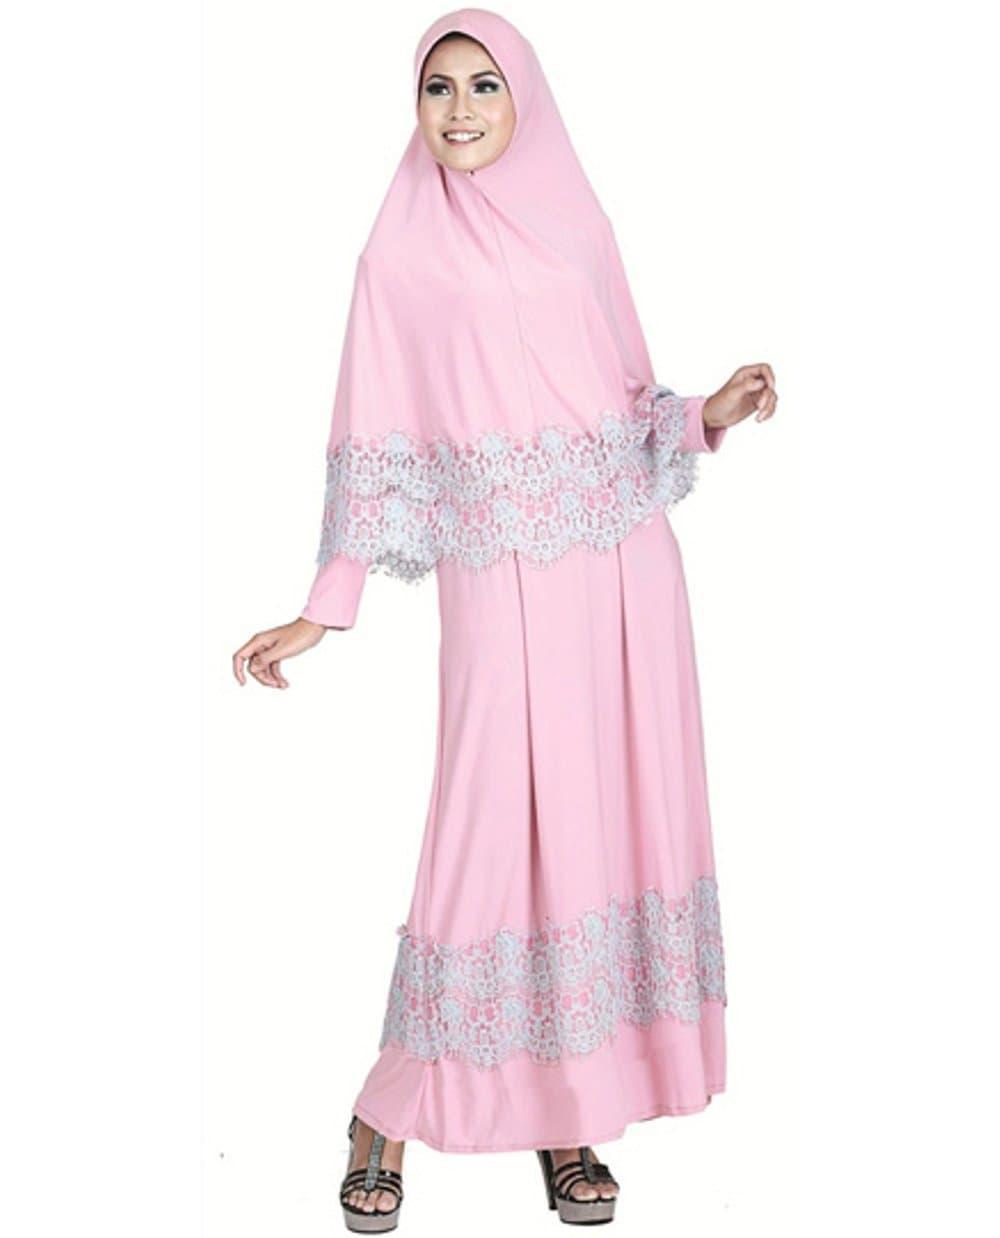 Baju Muslim Gamis Kode SNS 784B | Butik Baju Bandung Limited